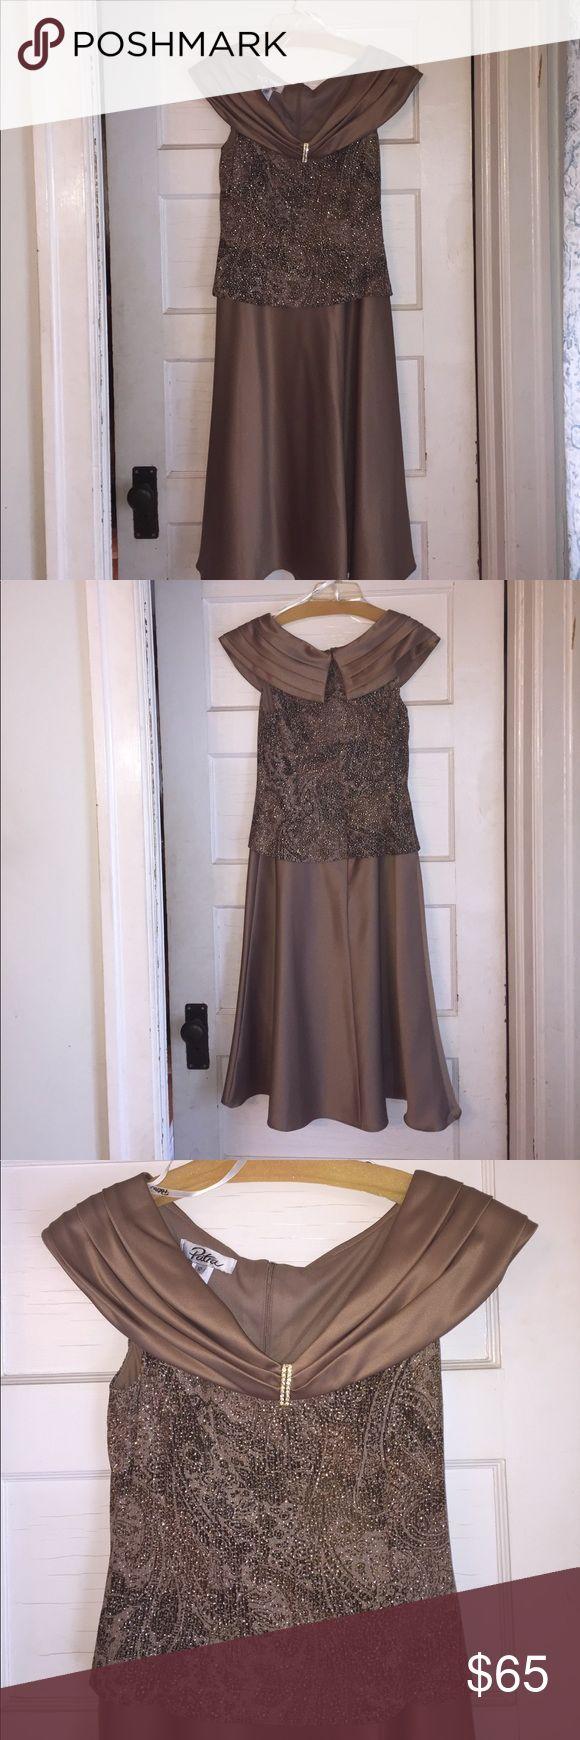 Worn once. Patra metallic formal dress. Gold metallic 43 in. formal dress. This is a great dress for a wedding, afternoon tea, cruise dinner or any formal gathering. Patra Dresses Wedding